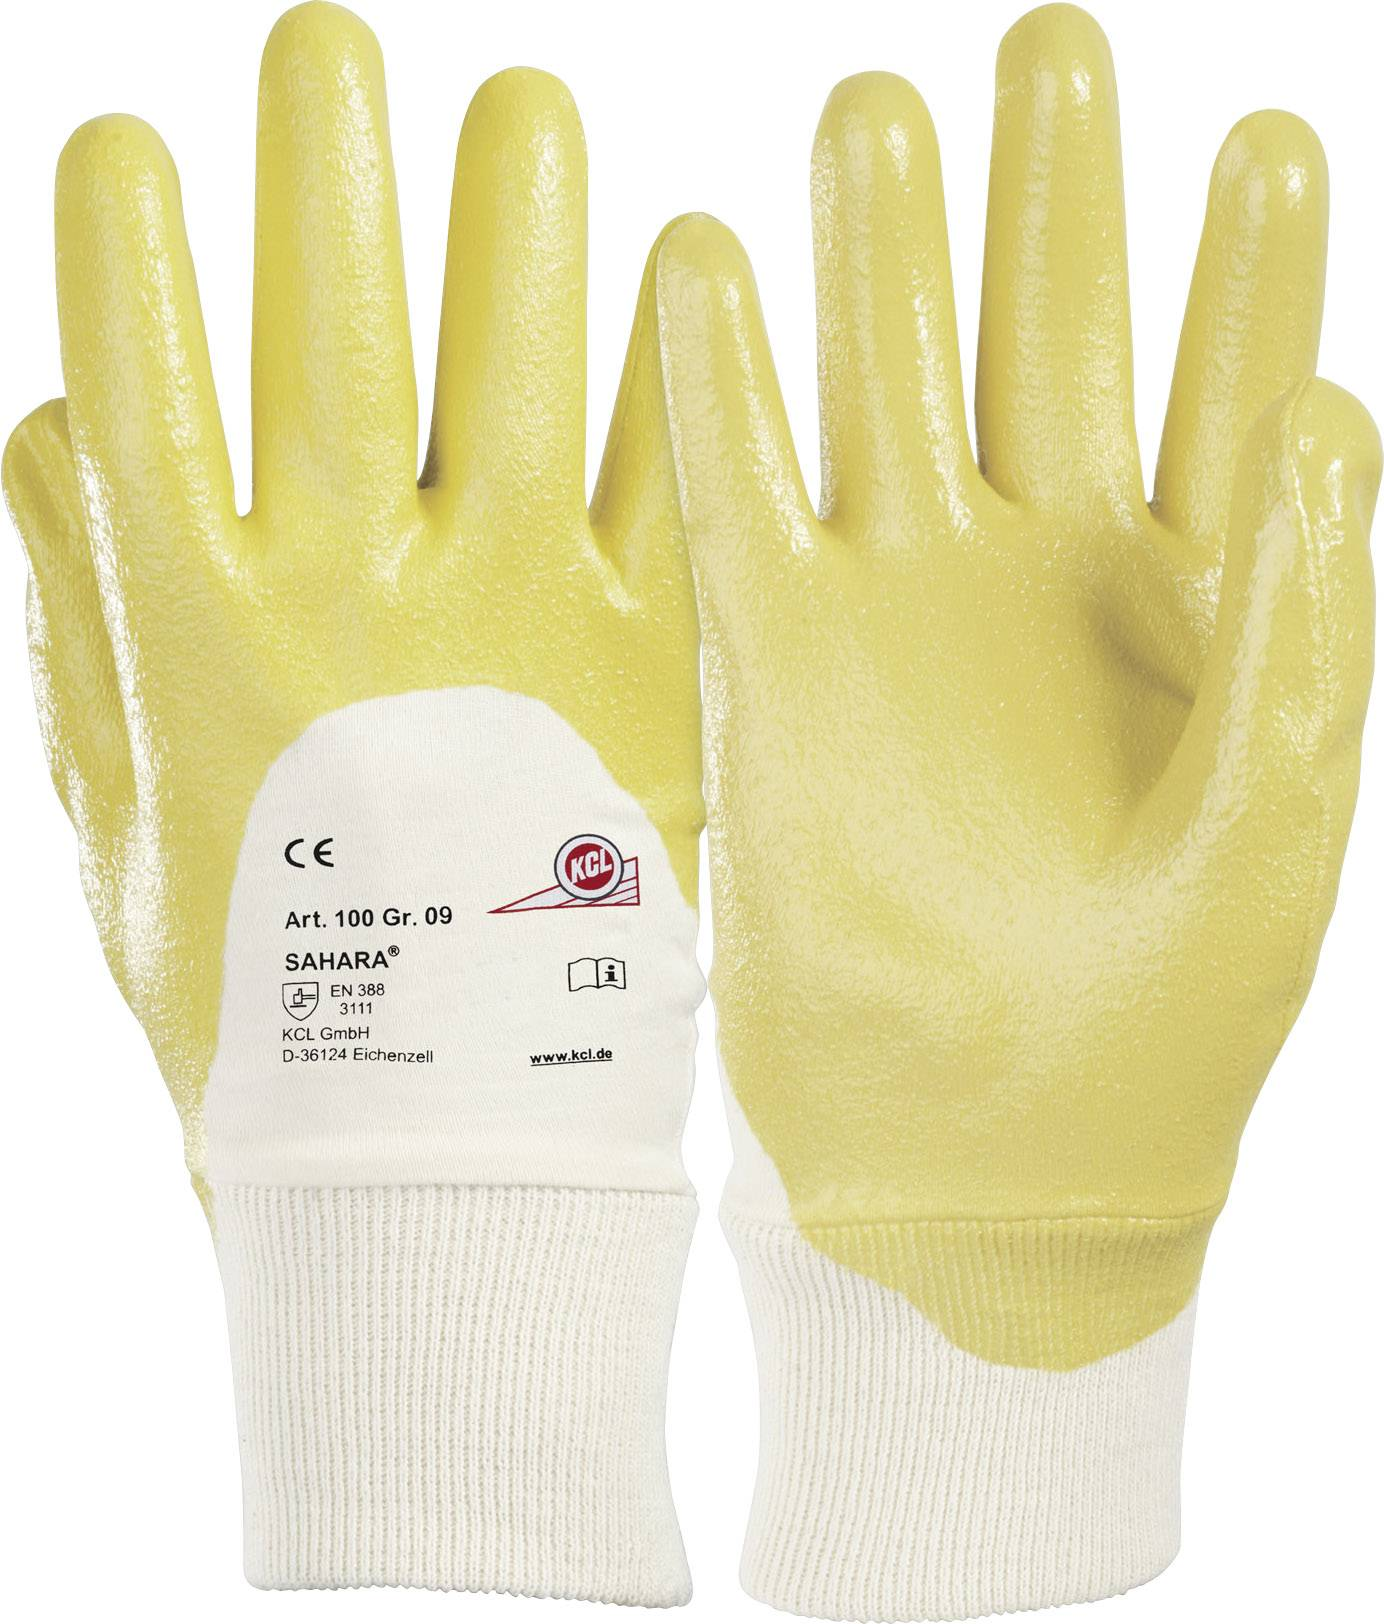 Pracovné rukavice KCL Sahara® 100, velikost rukavic: 7, S